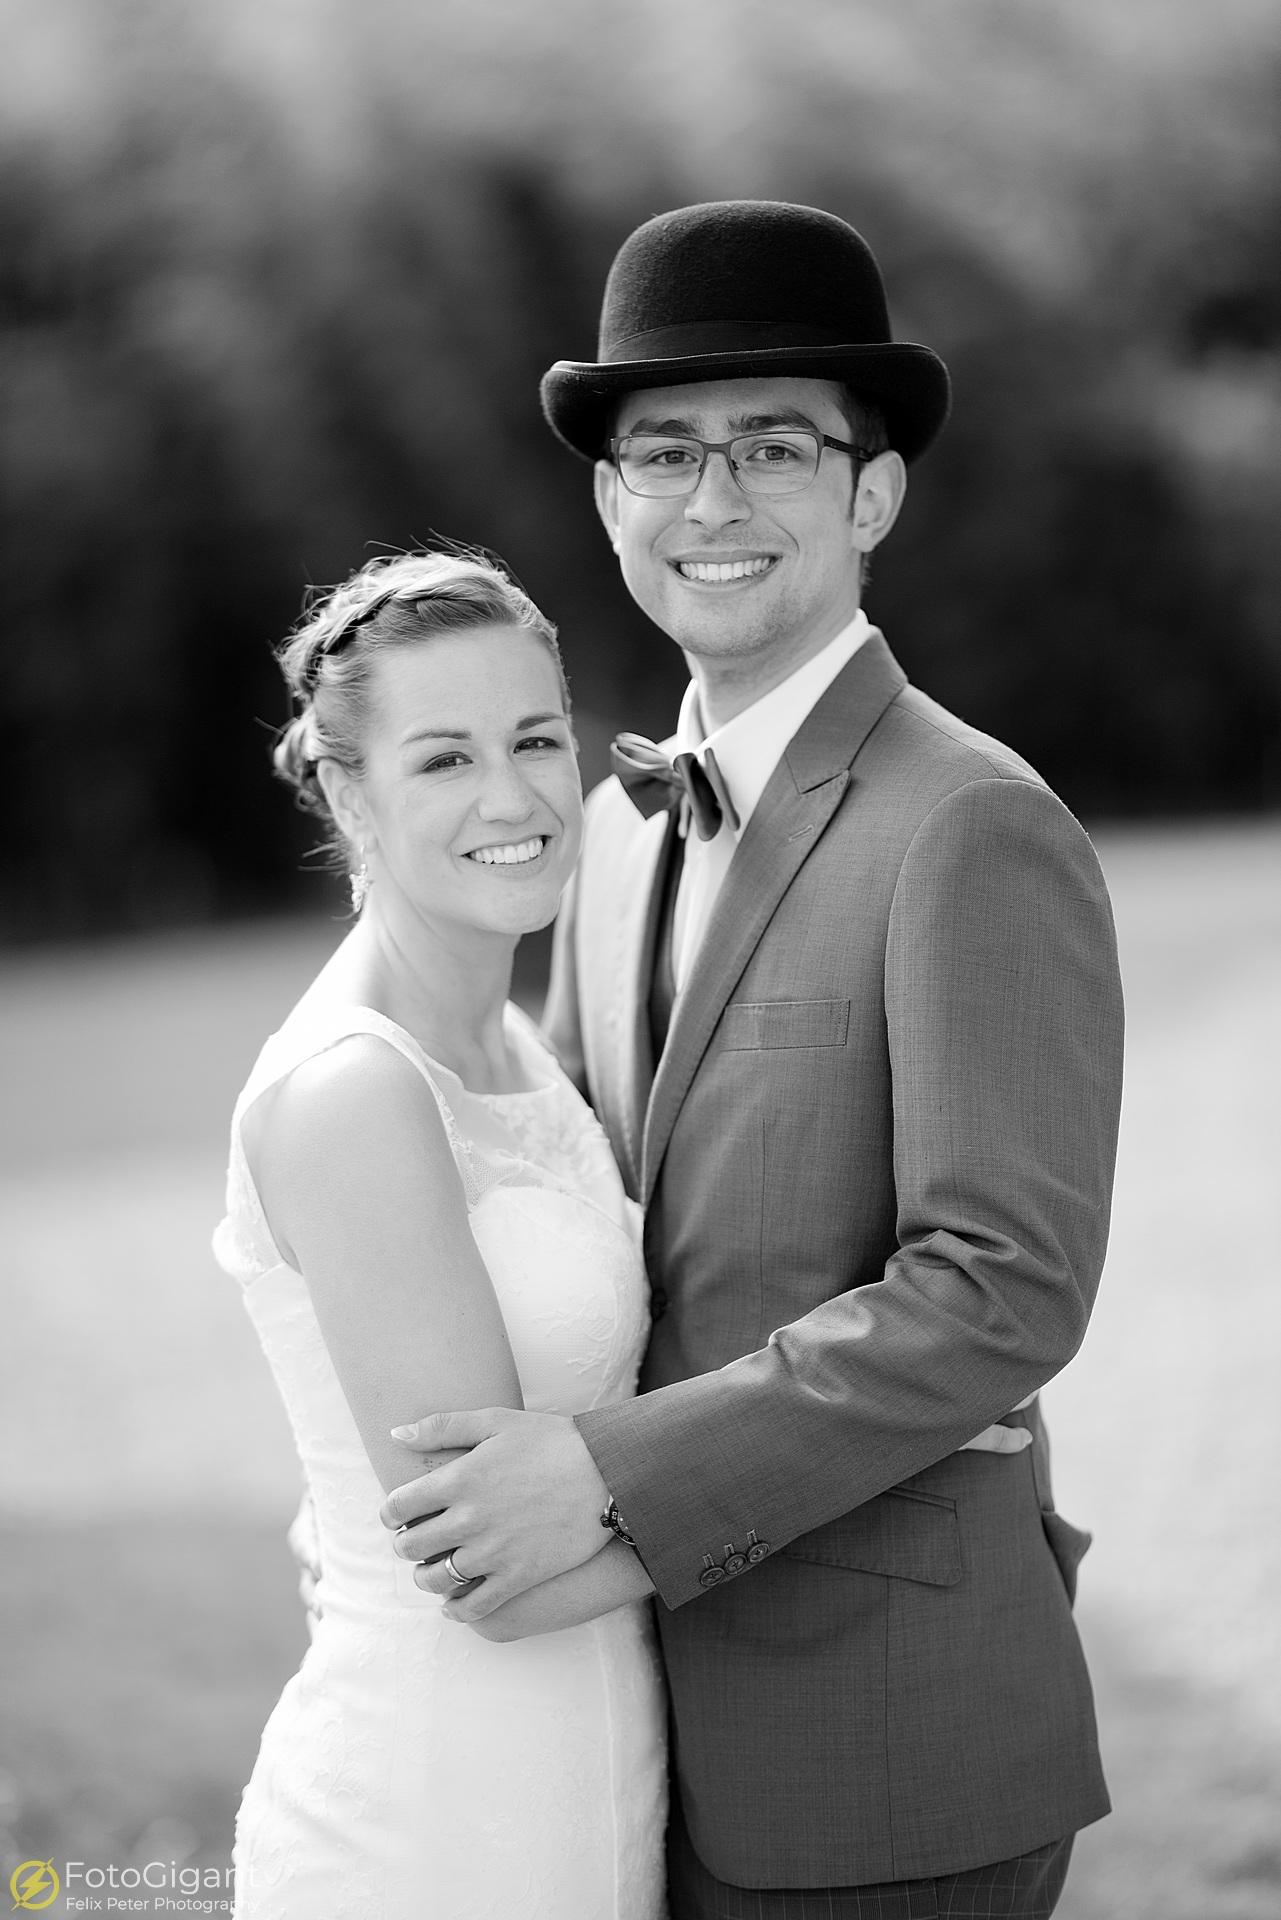 Hochzeitsfotografiekurs_Fotograf_Felix_Peter_21.jpg